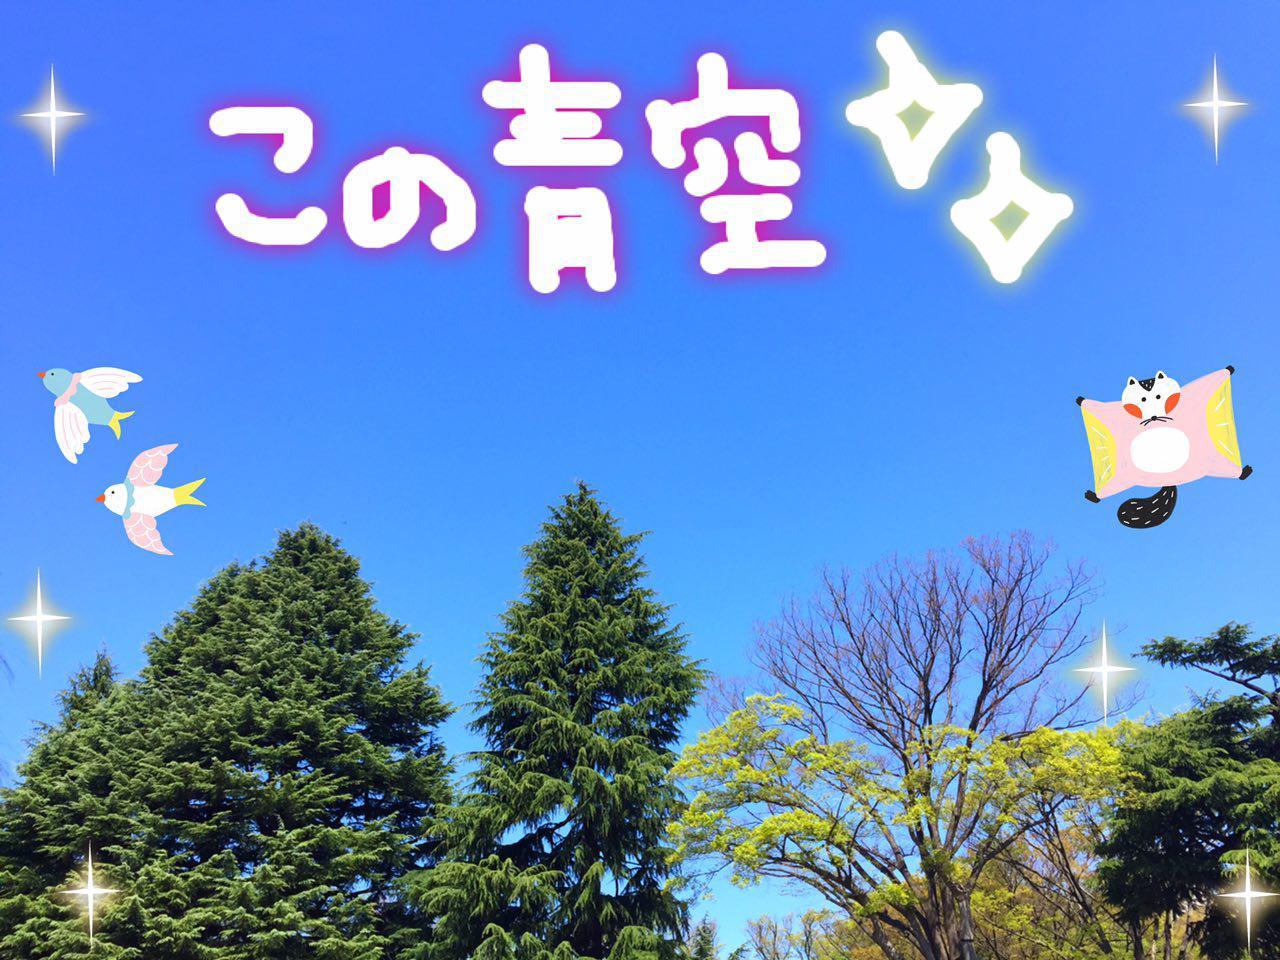 photo_2017-04-24_00-59-55.jpg